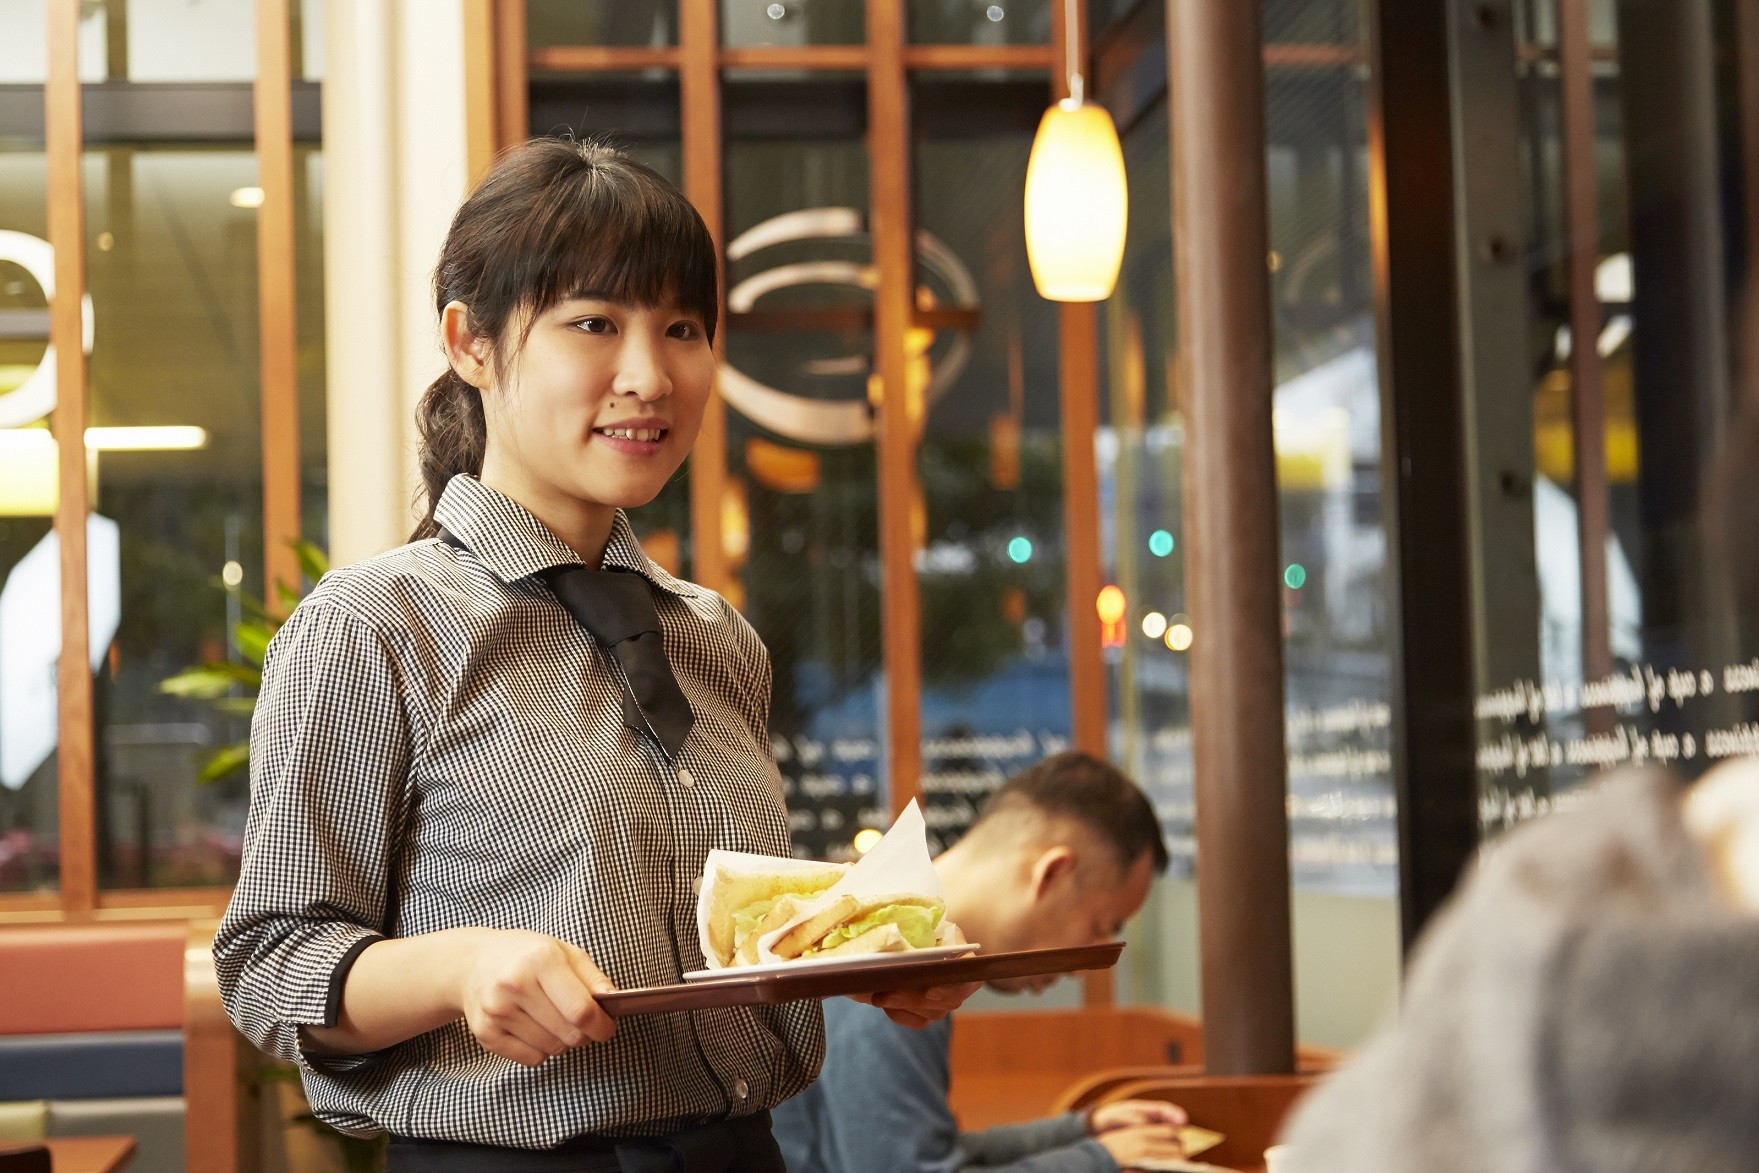 CAFE de CRIE(カフェ・ド・クリエ) 大森山王 のアルバイト情報